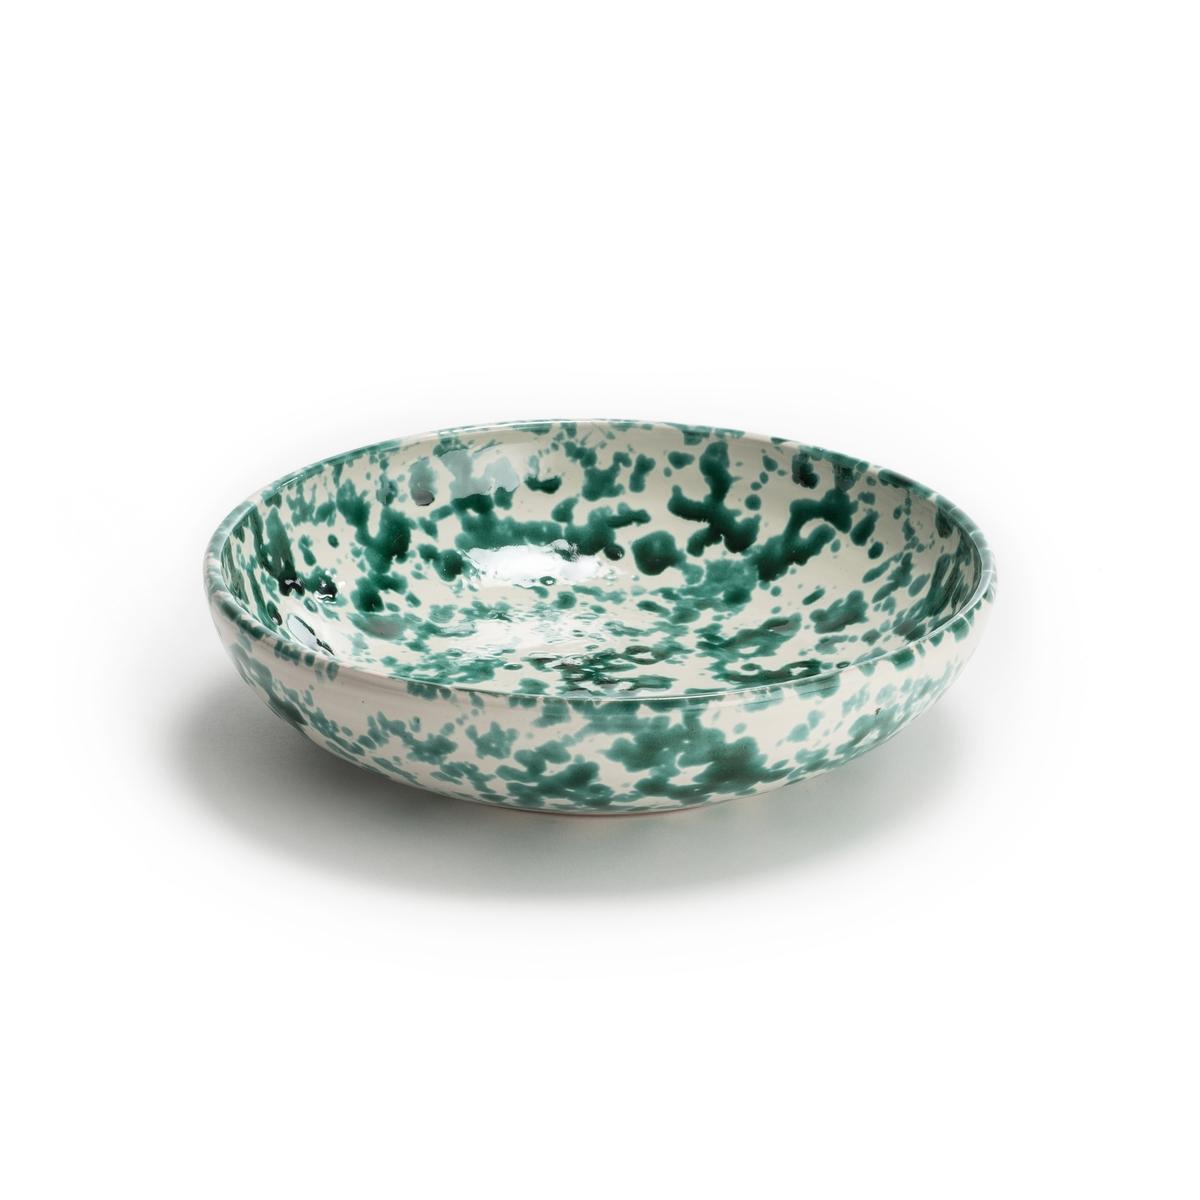 Ariana Speckled Bowl, Diameter 25 cm